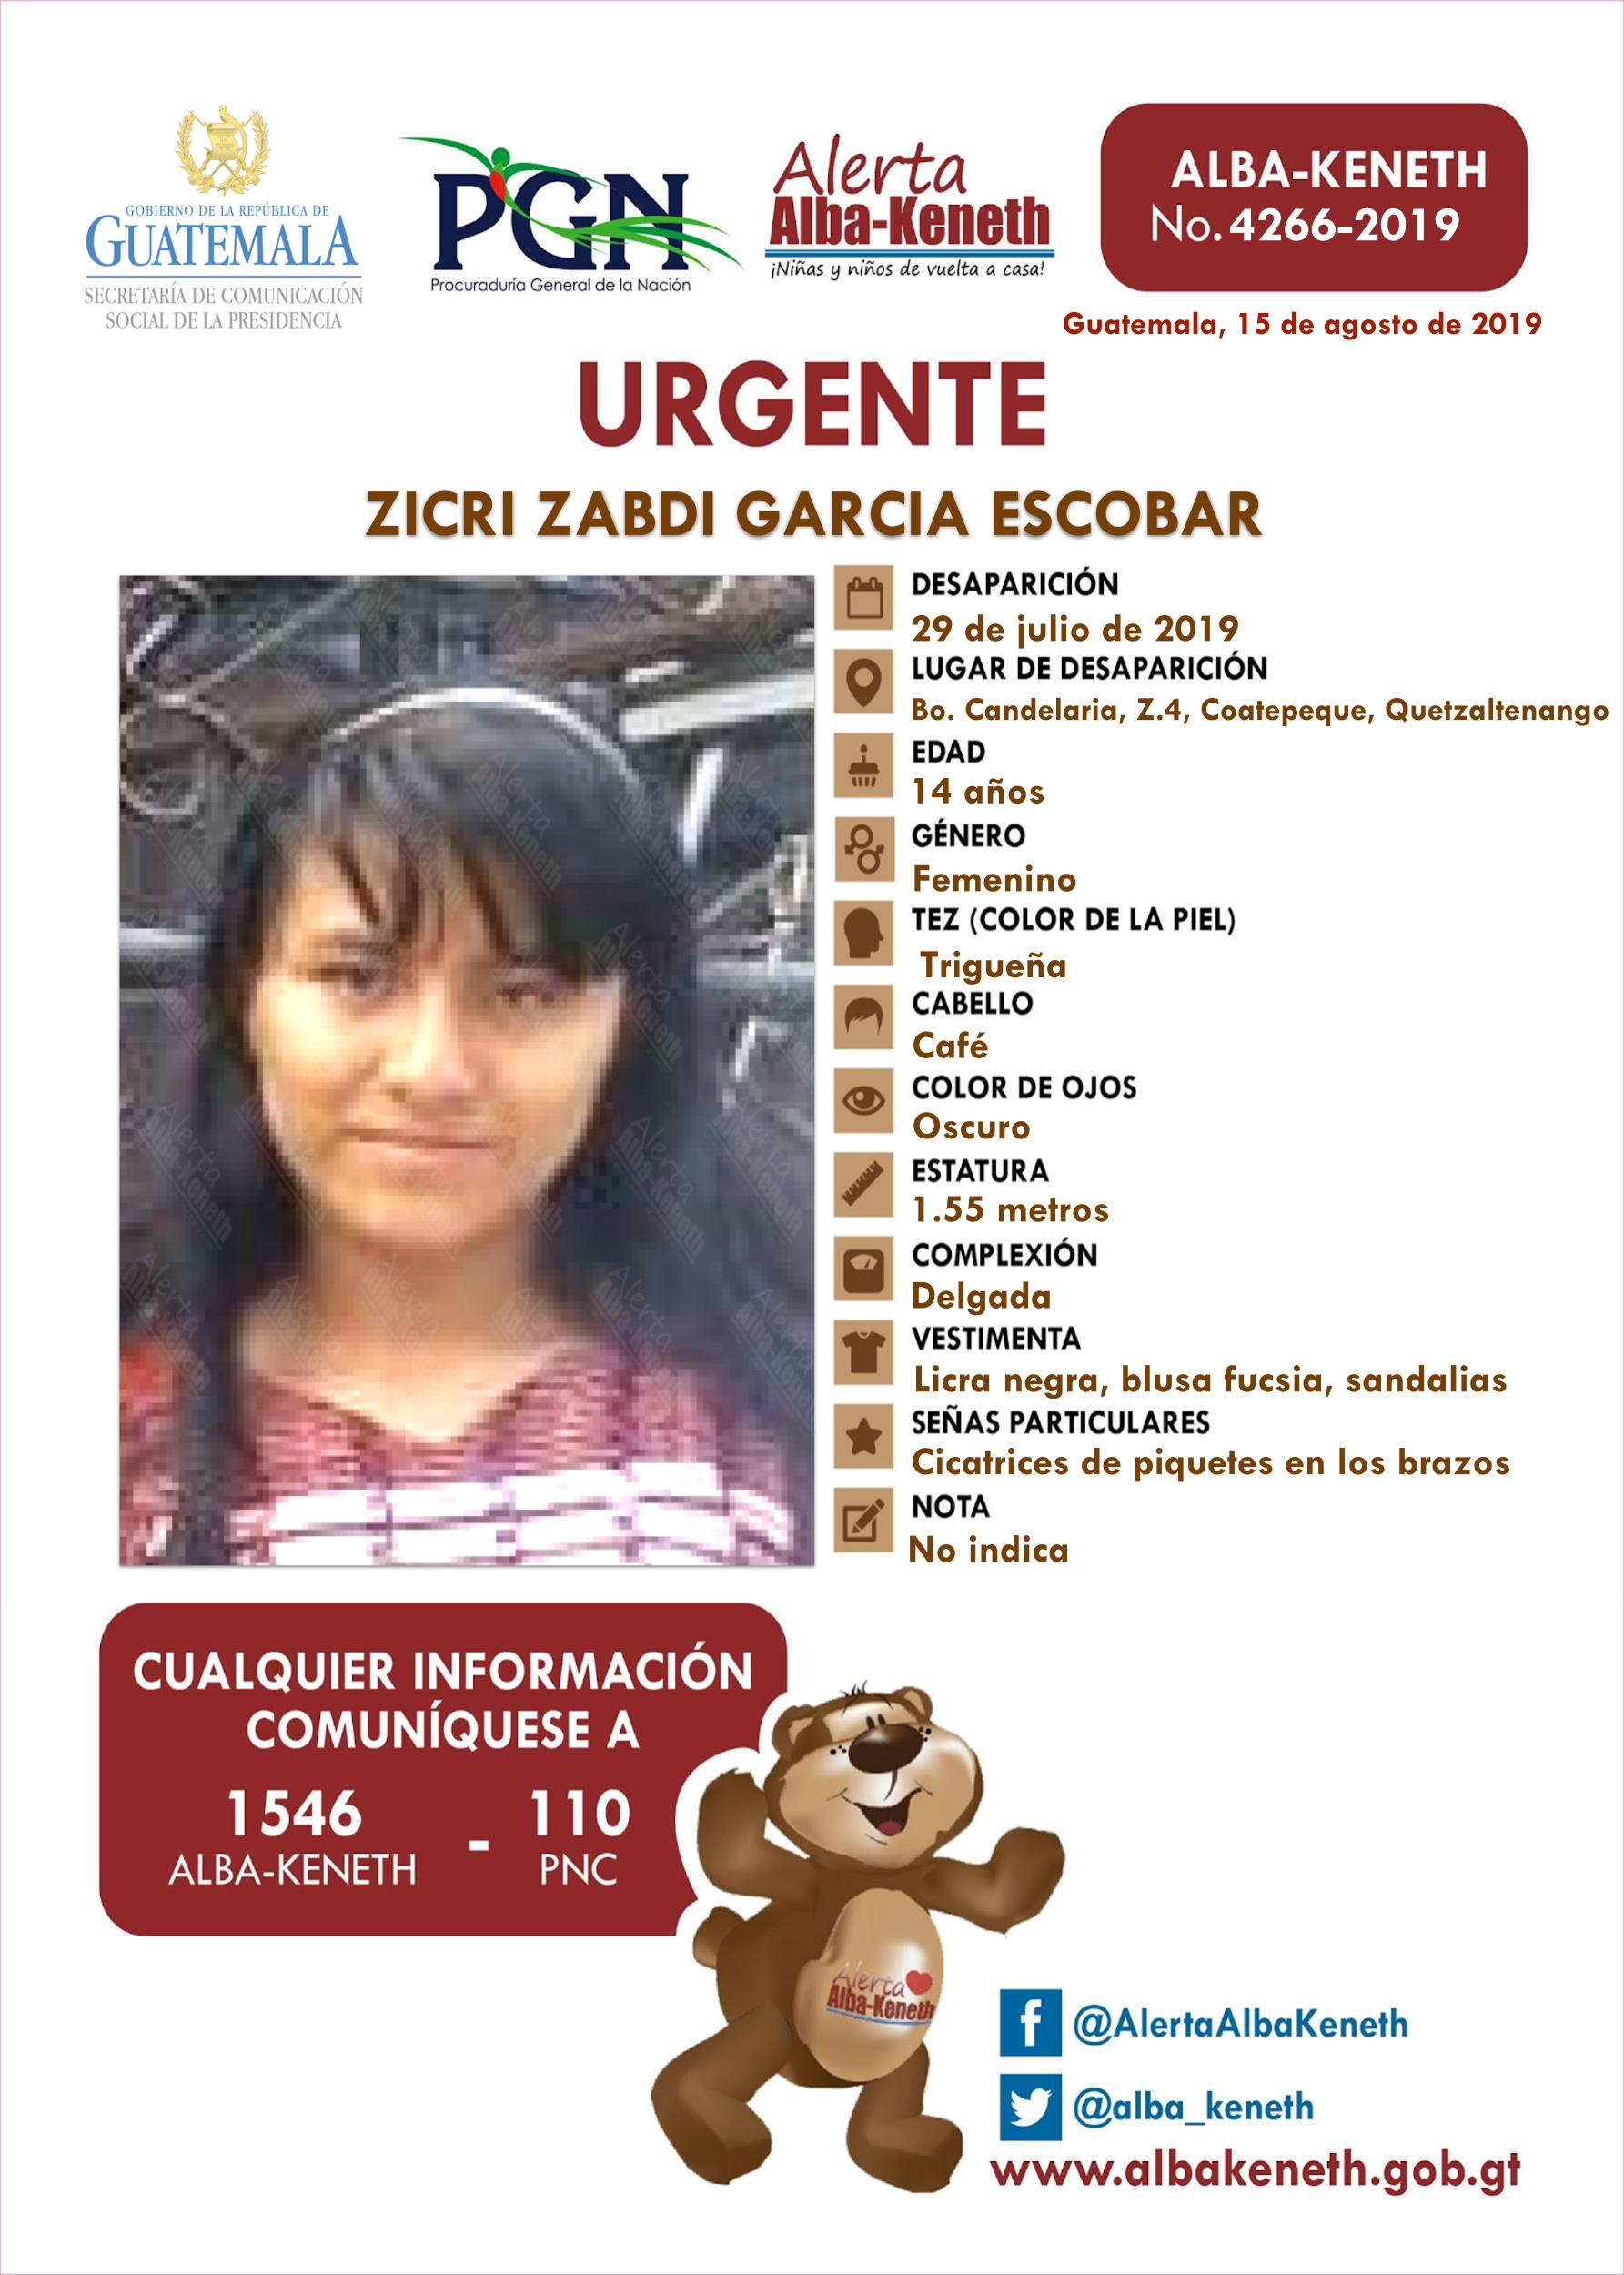 Zicri Zabdi Garcia Escobar